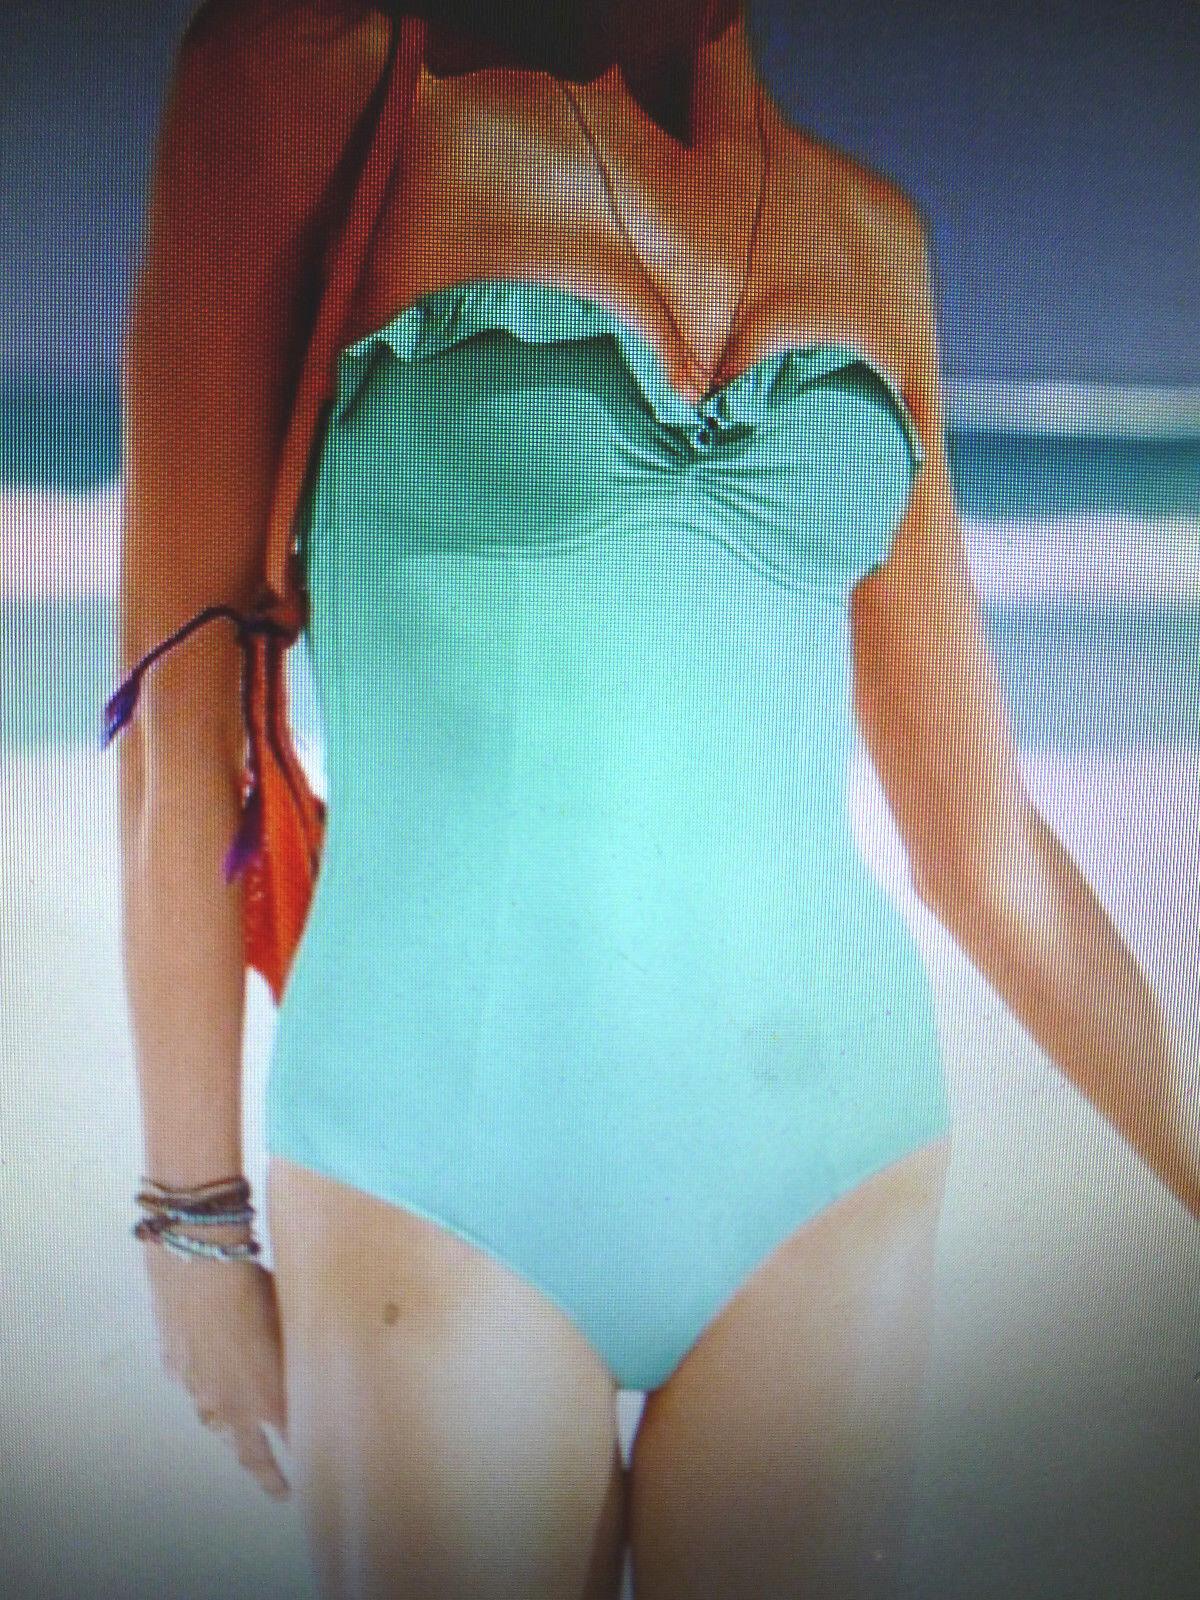 Victoria's Secret MADI Aqua Mist Ruffle Ruffle Ruffle Push-up One Piece Swimsuit SZ-10B bea6d8